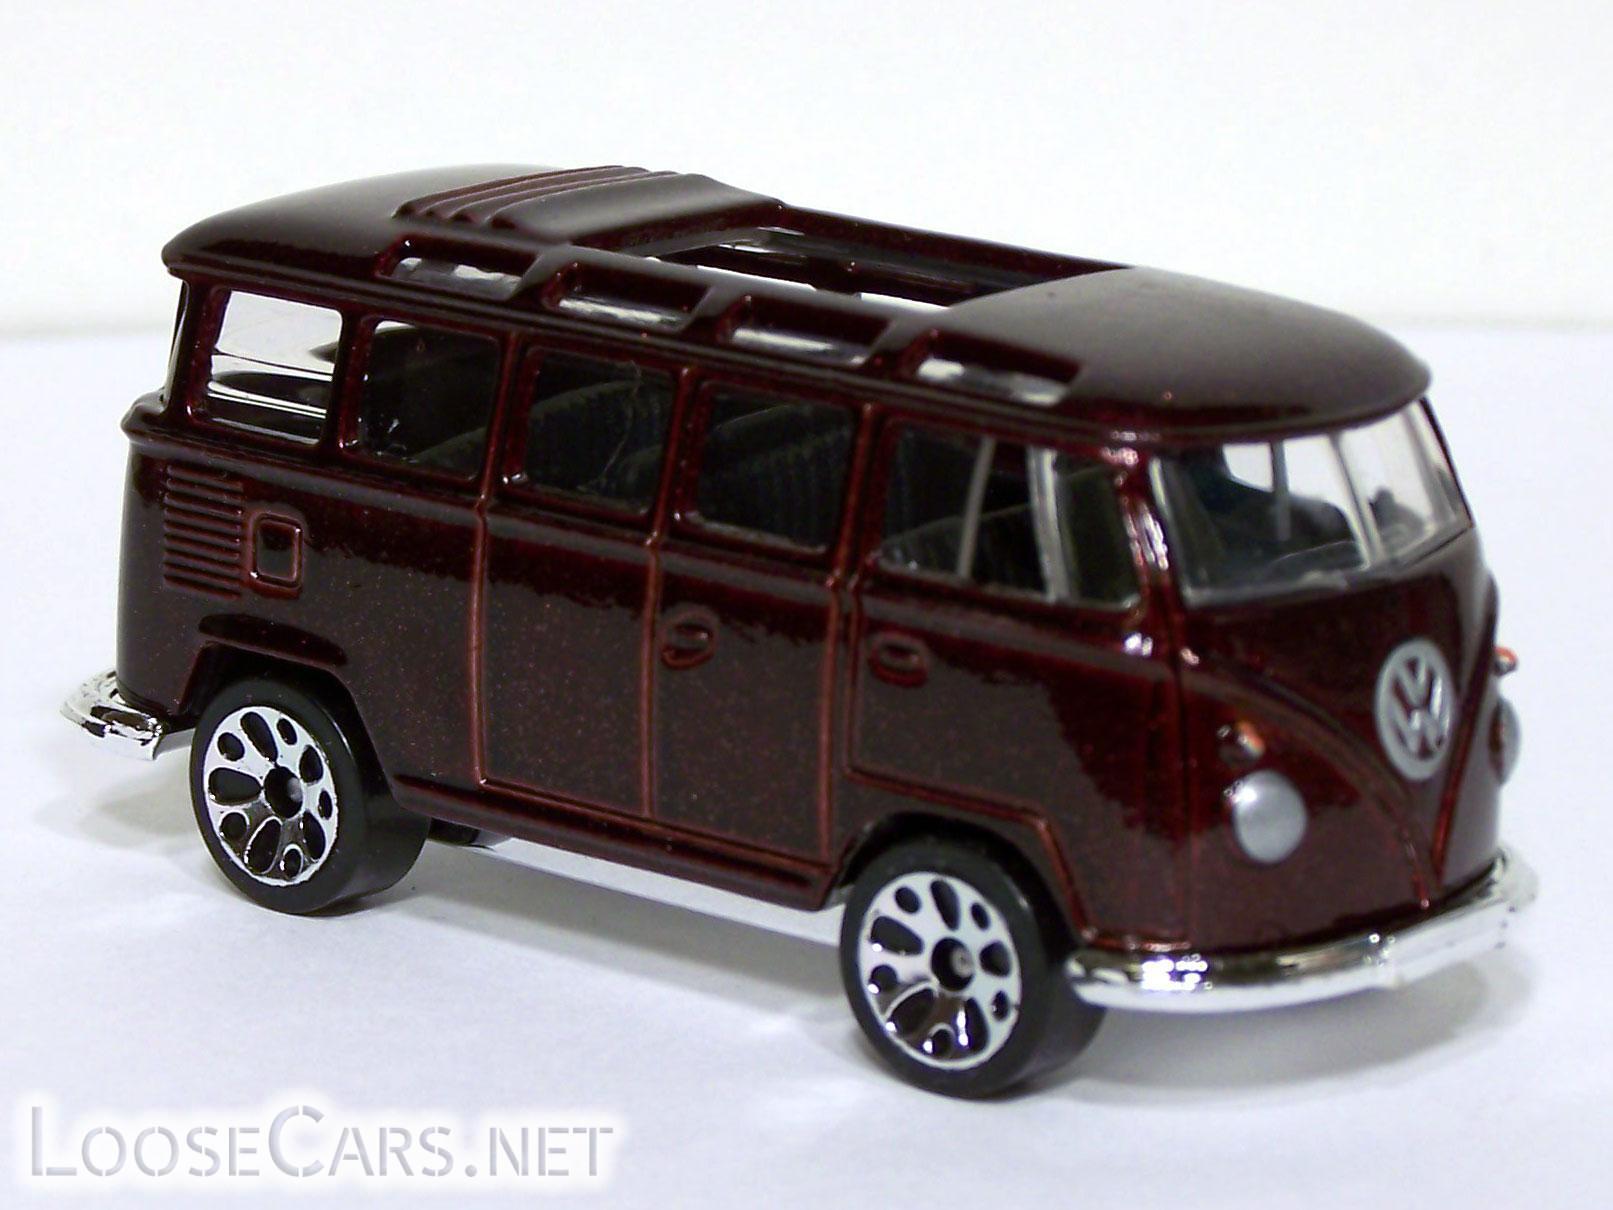 Matchbox VW Transporter: 2005 Stars of Cars Front Right